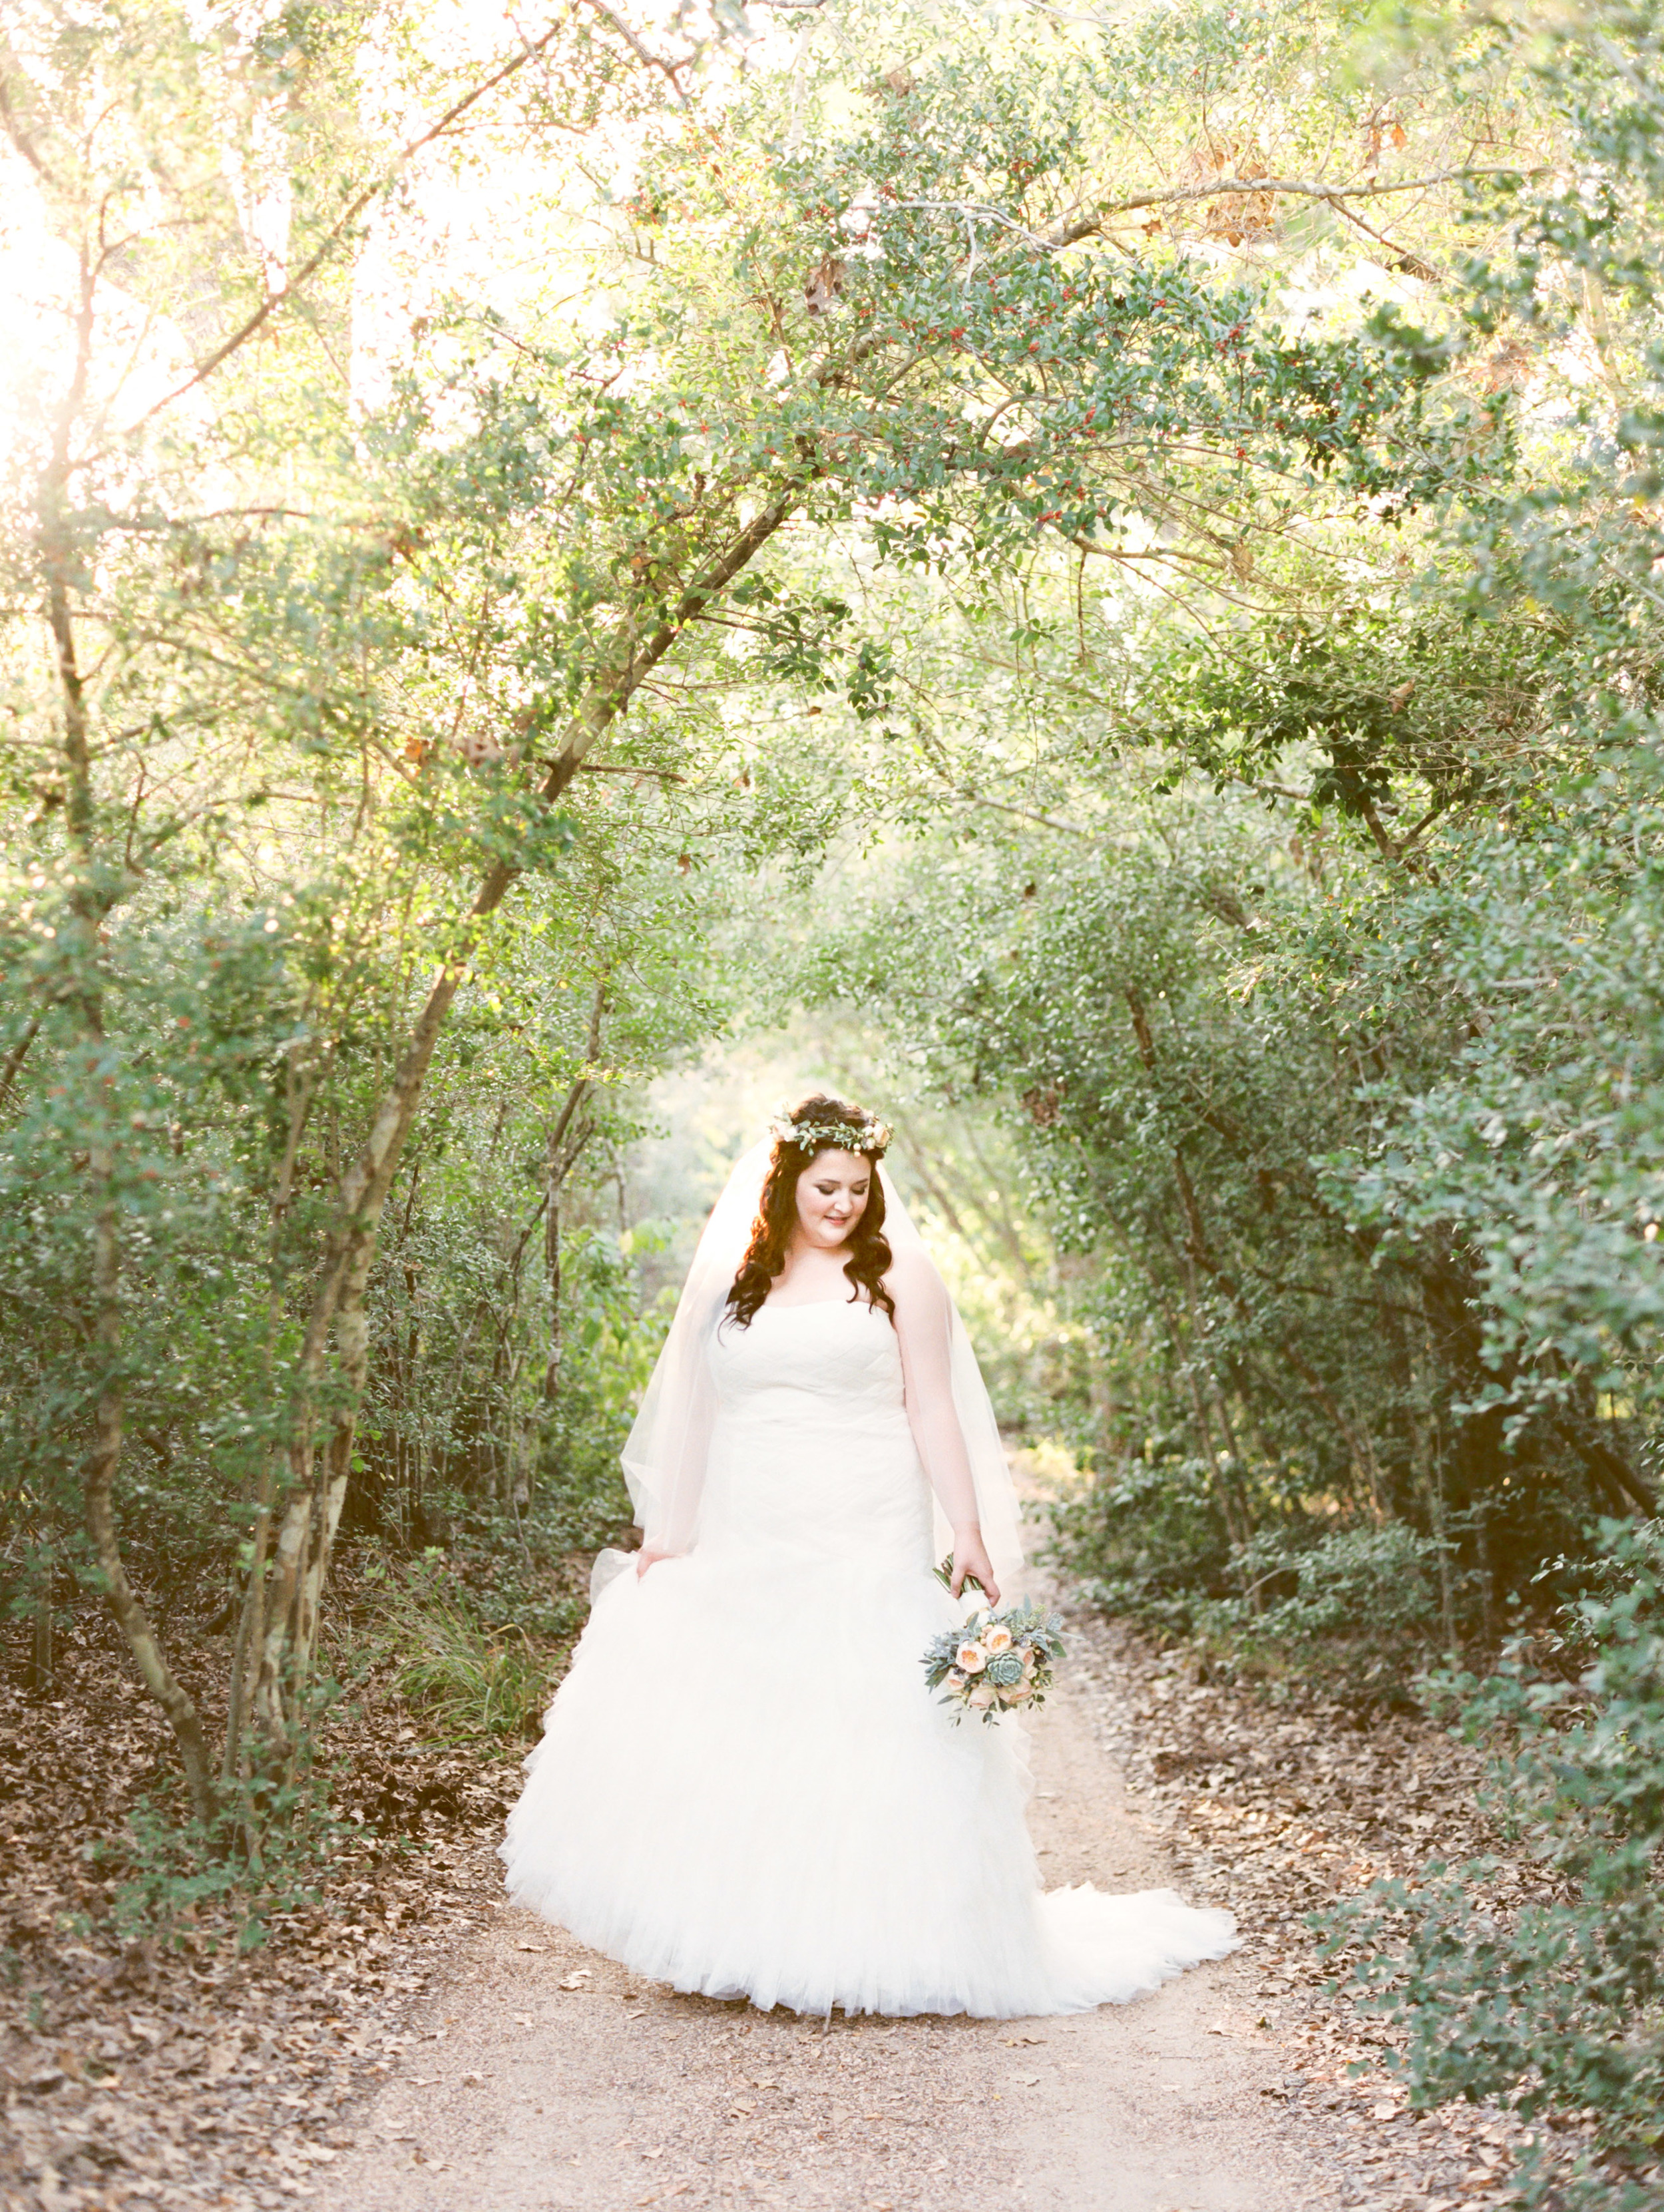 Sarah Best Photography - Elizabeth's Bridals - 7F Lodge-113.jpg